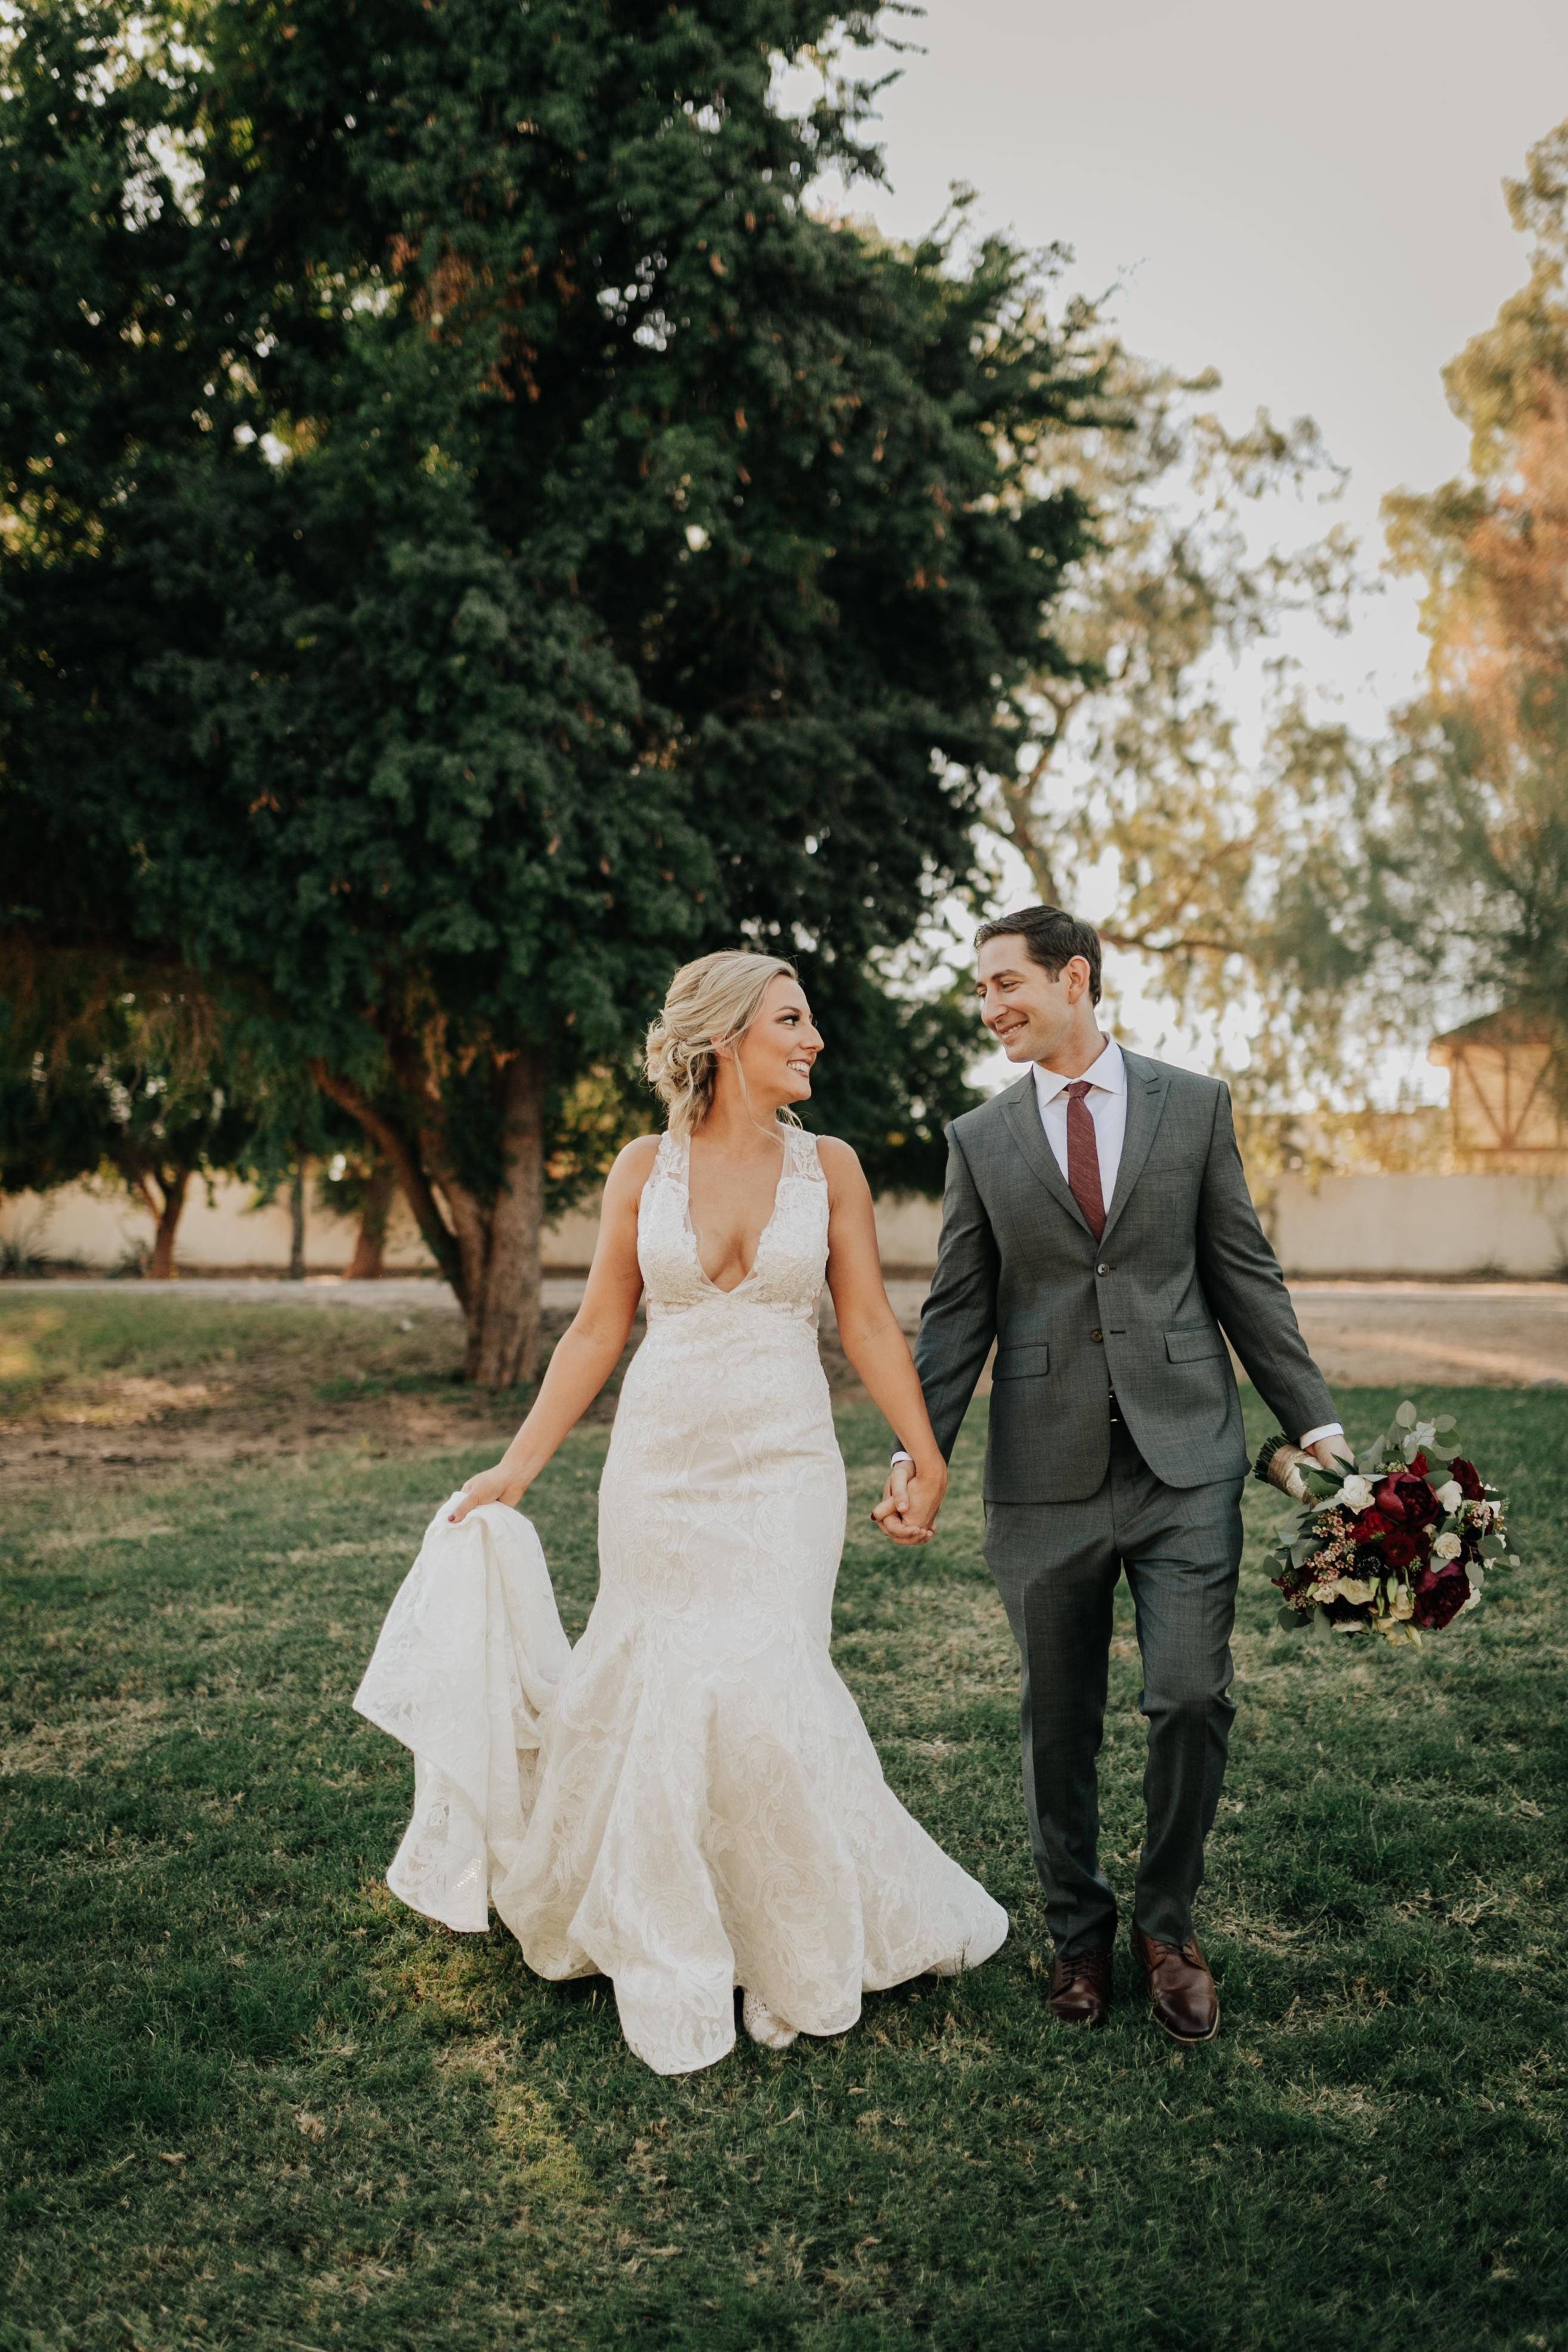 beautiful wedding photo